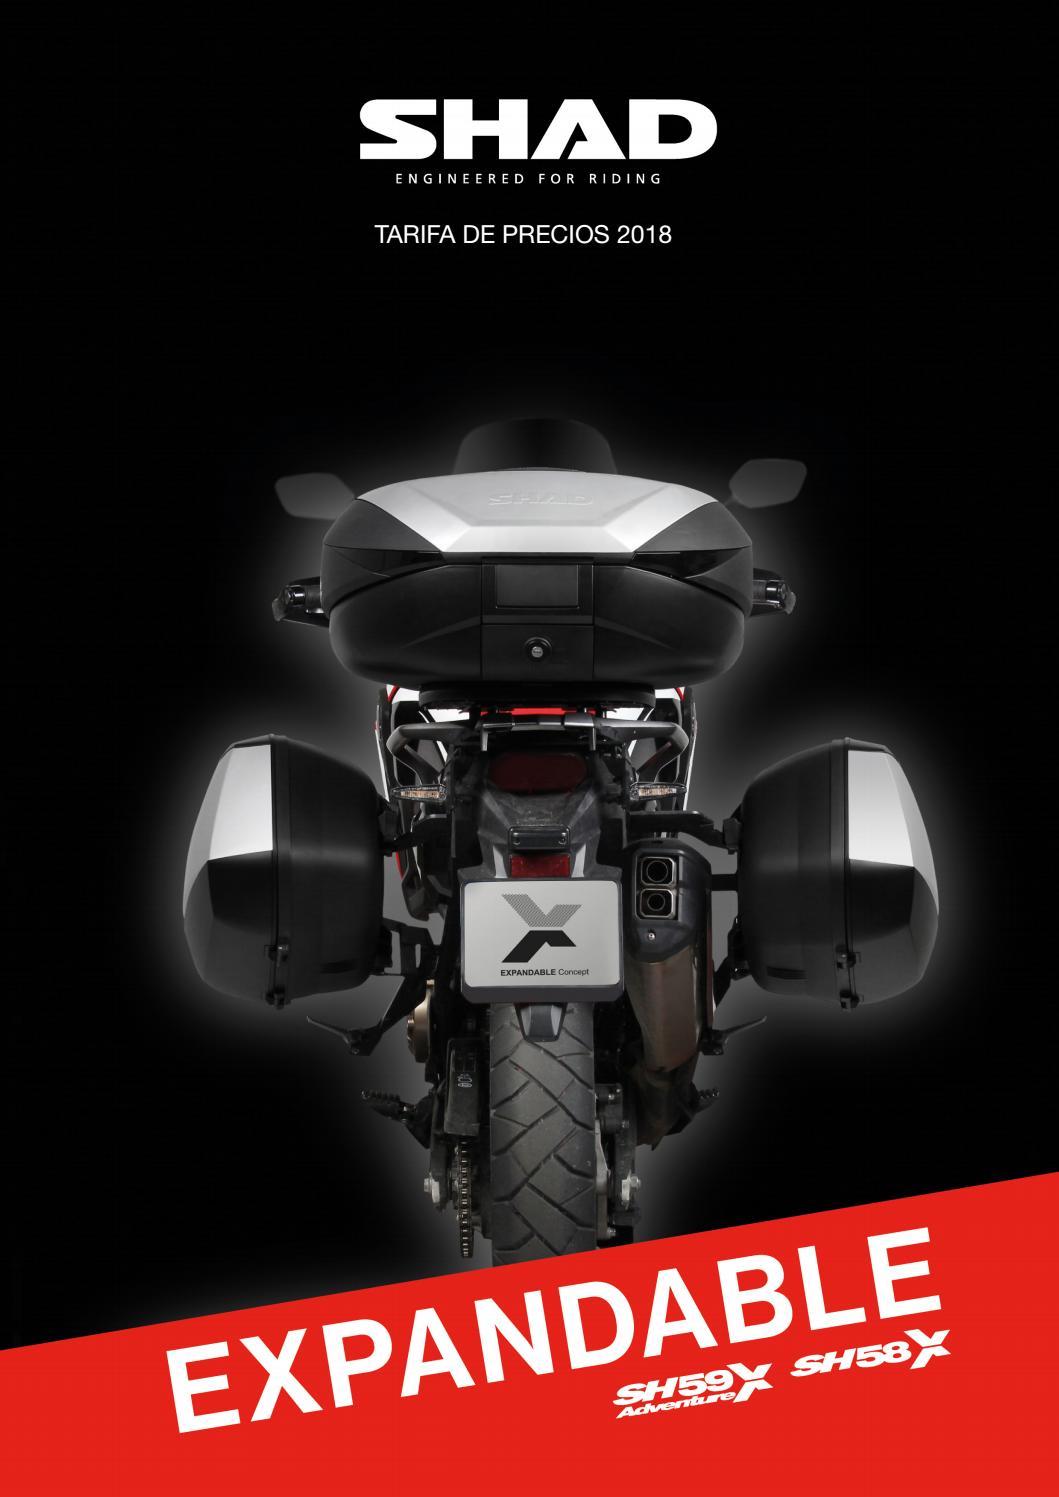 ab20dc073 Tarifa esp 2018 def by El Motorista S.L. - issuu